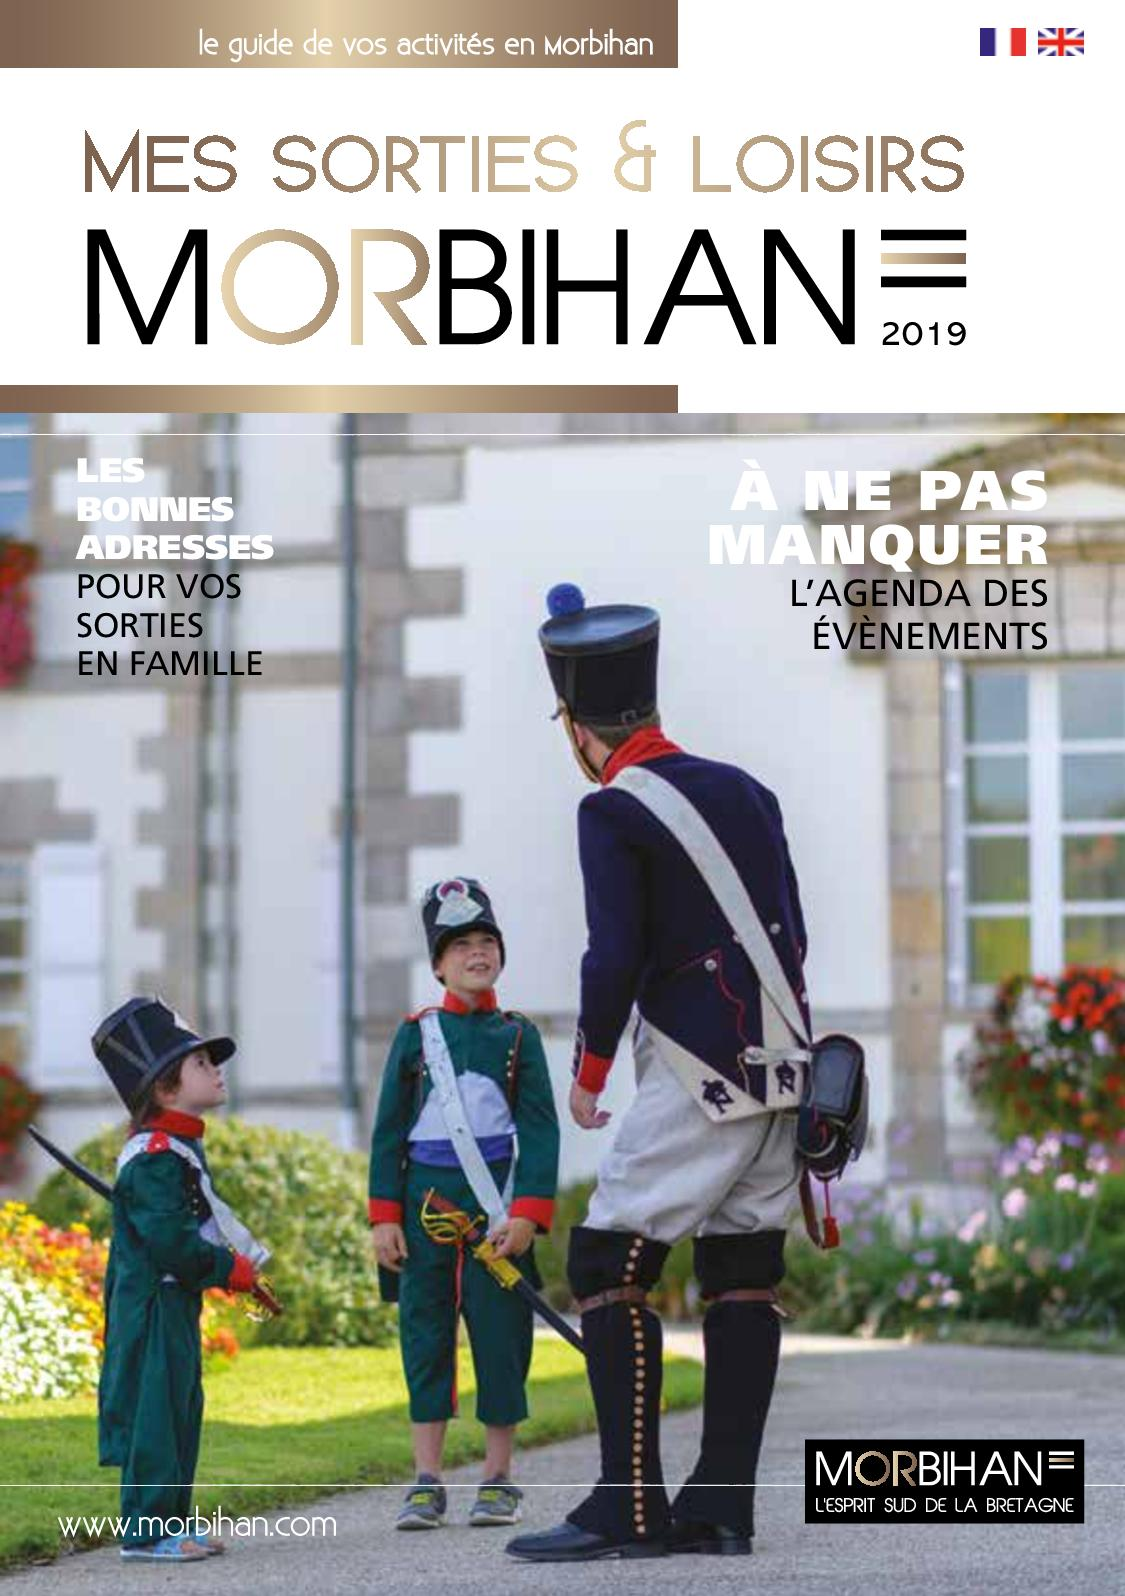 Loisirs Morbihan Guide Calaméo 2019 Tourisme xrdBCoe